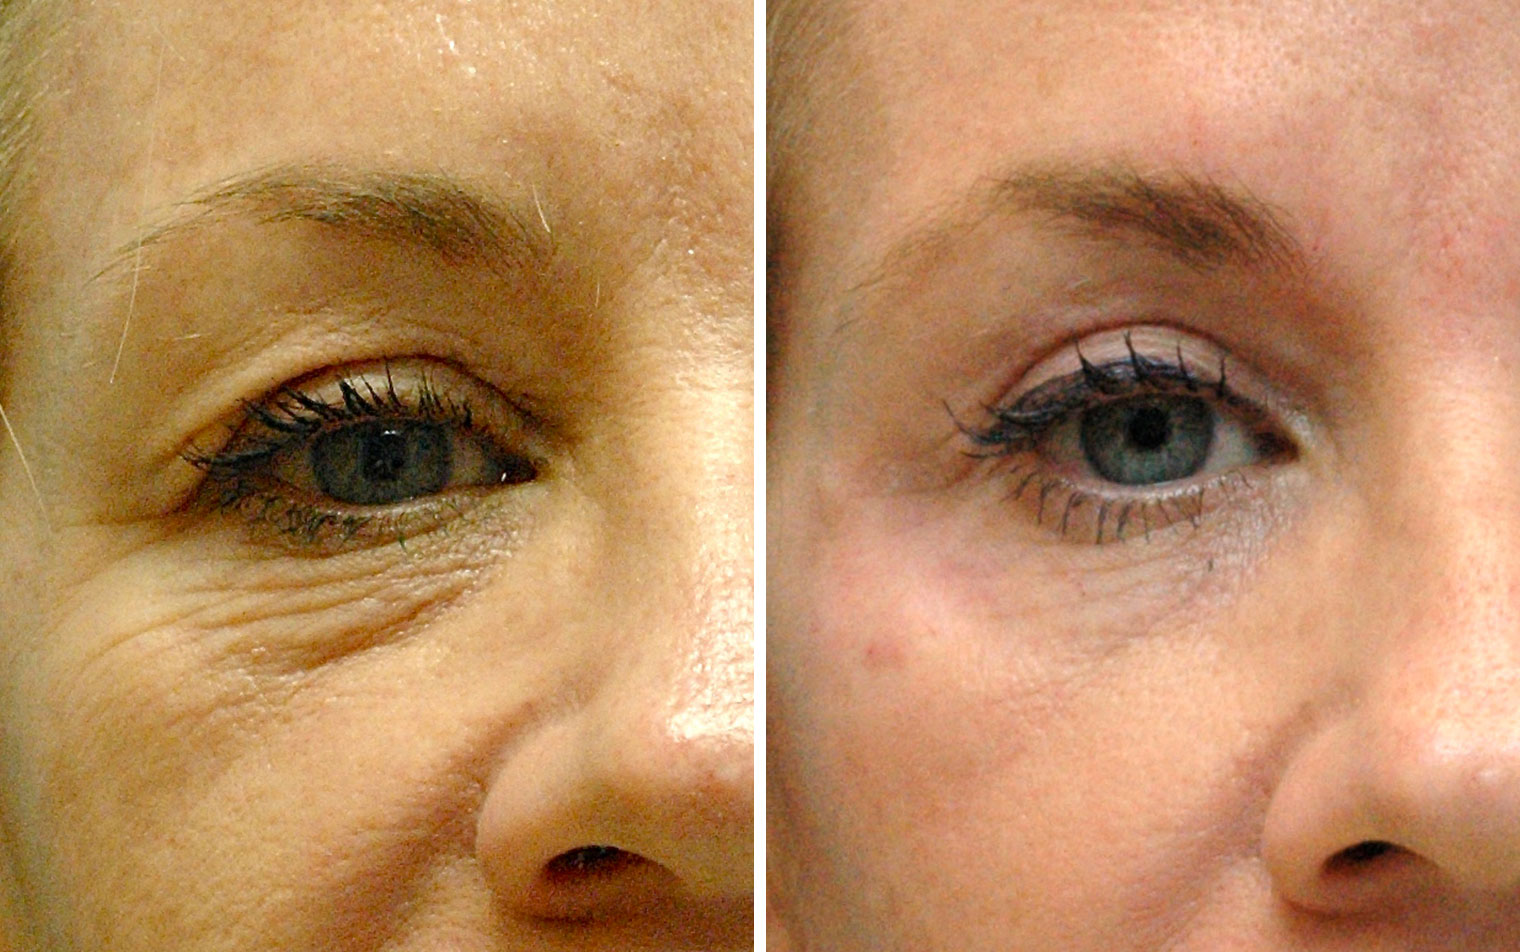 where upper and lower eyelids meet